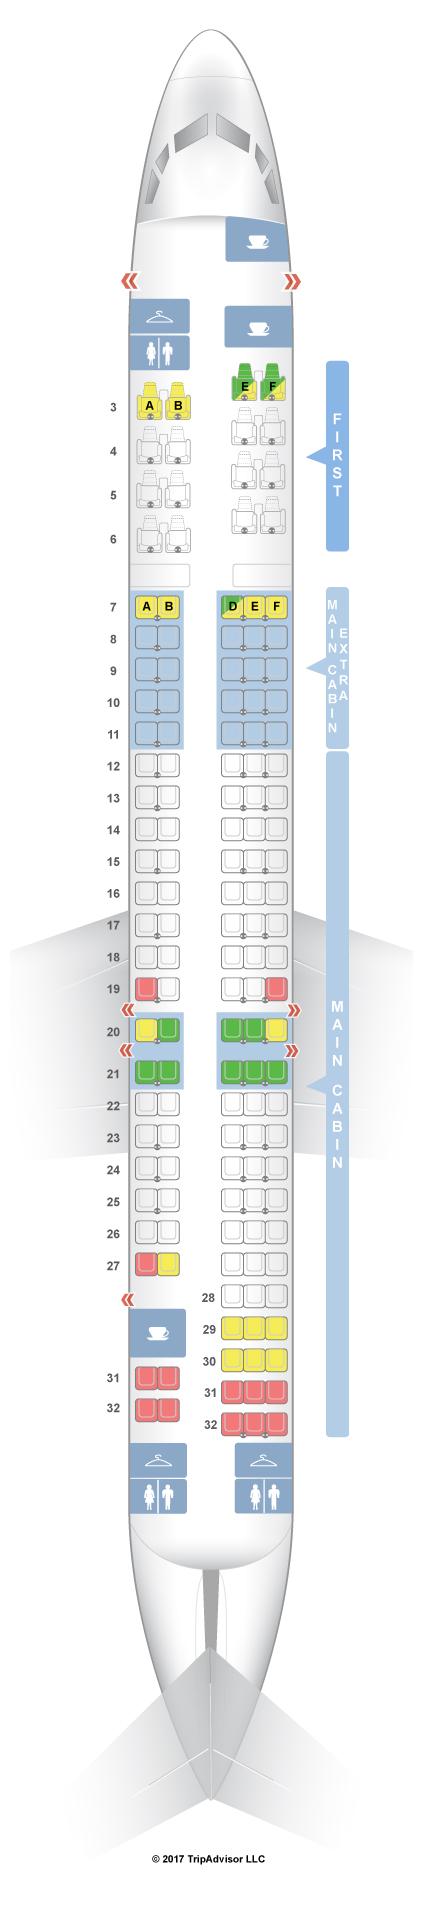 Seatguru Seat Map American Airlines Mcdonnell Douglas Md